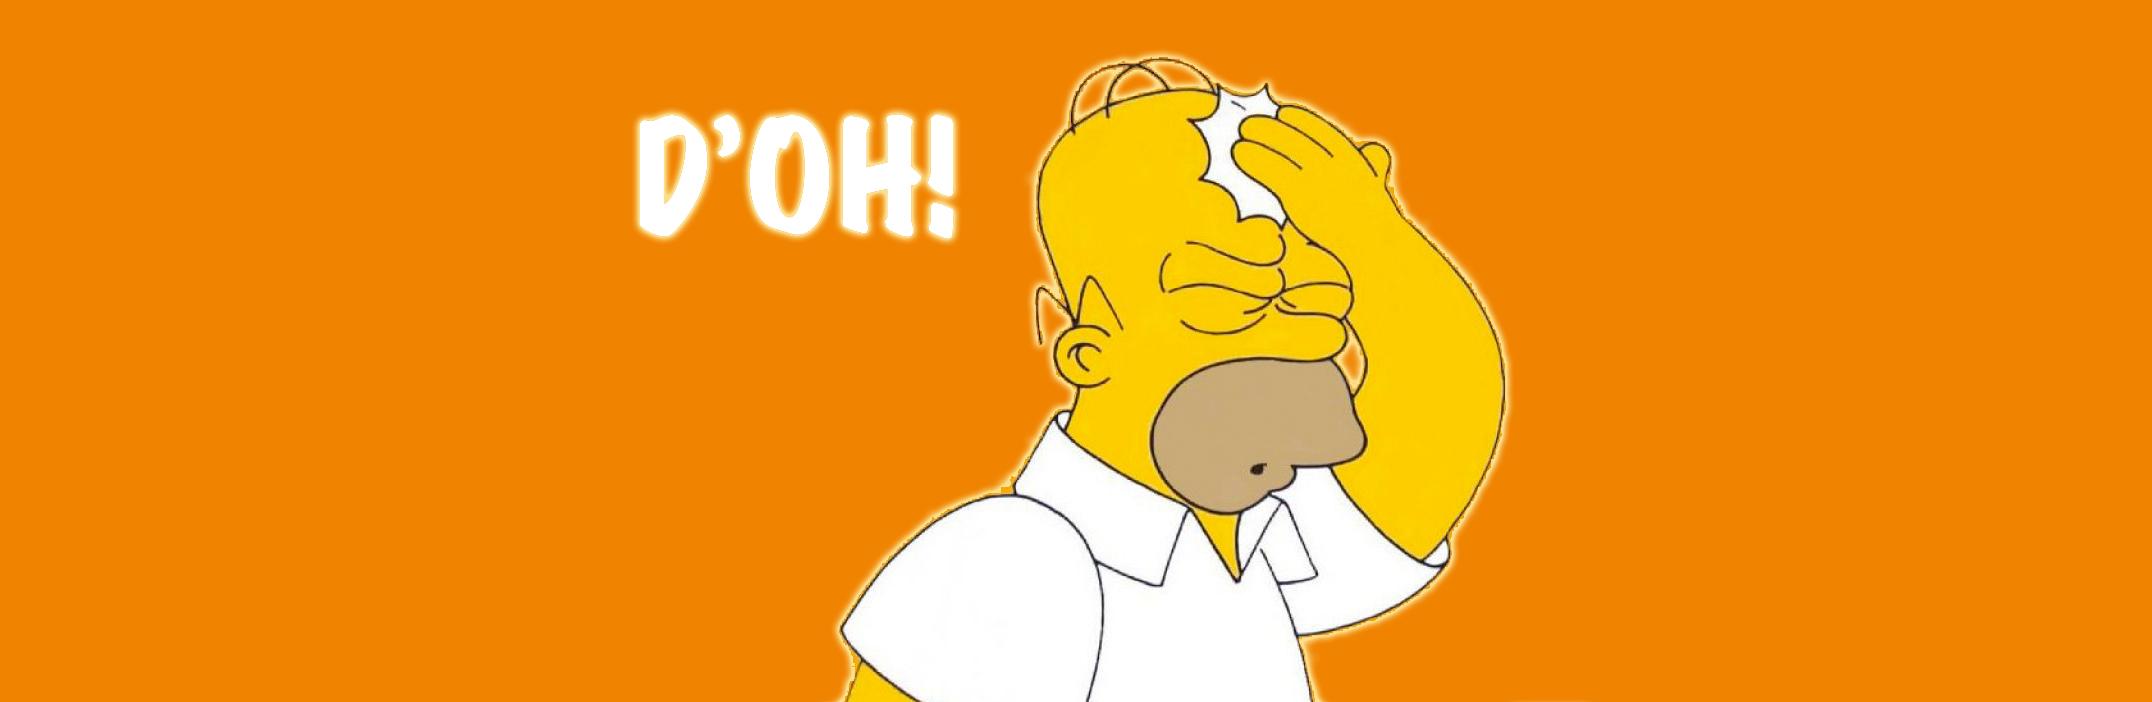 illustration omer simpson doh!